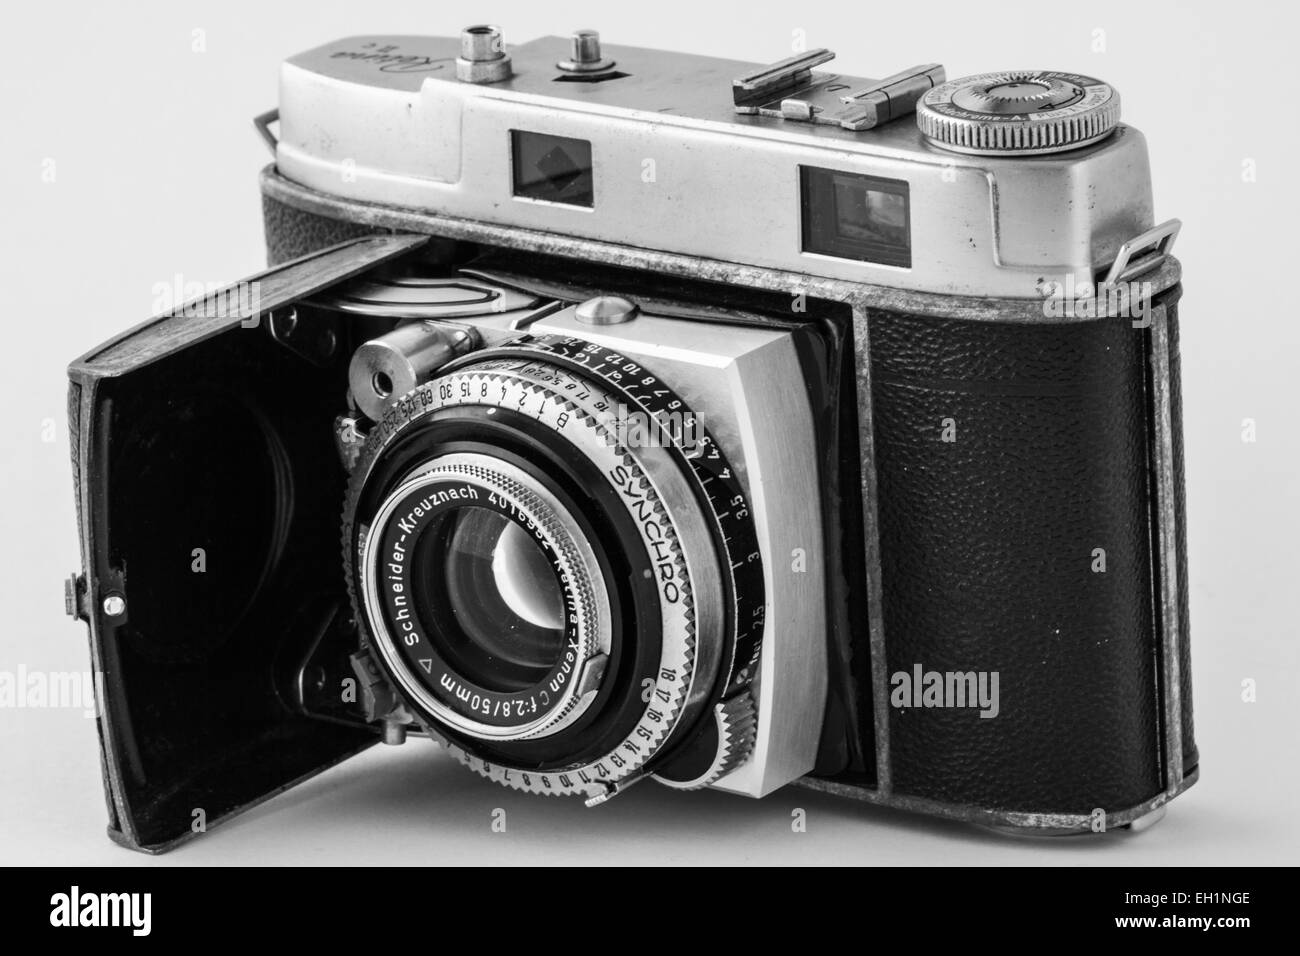 Kodak Retina 2c, a rangefinder camera popular in the 50s and 60s. - Stock Image